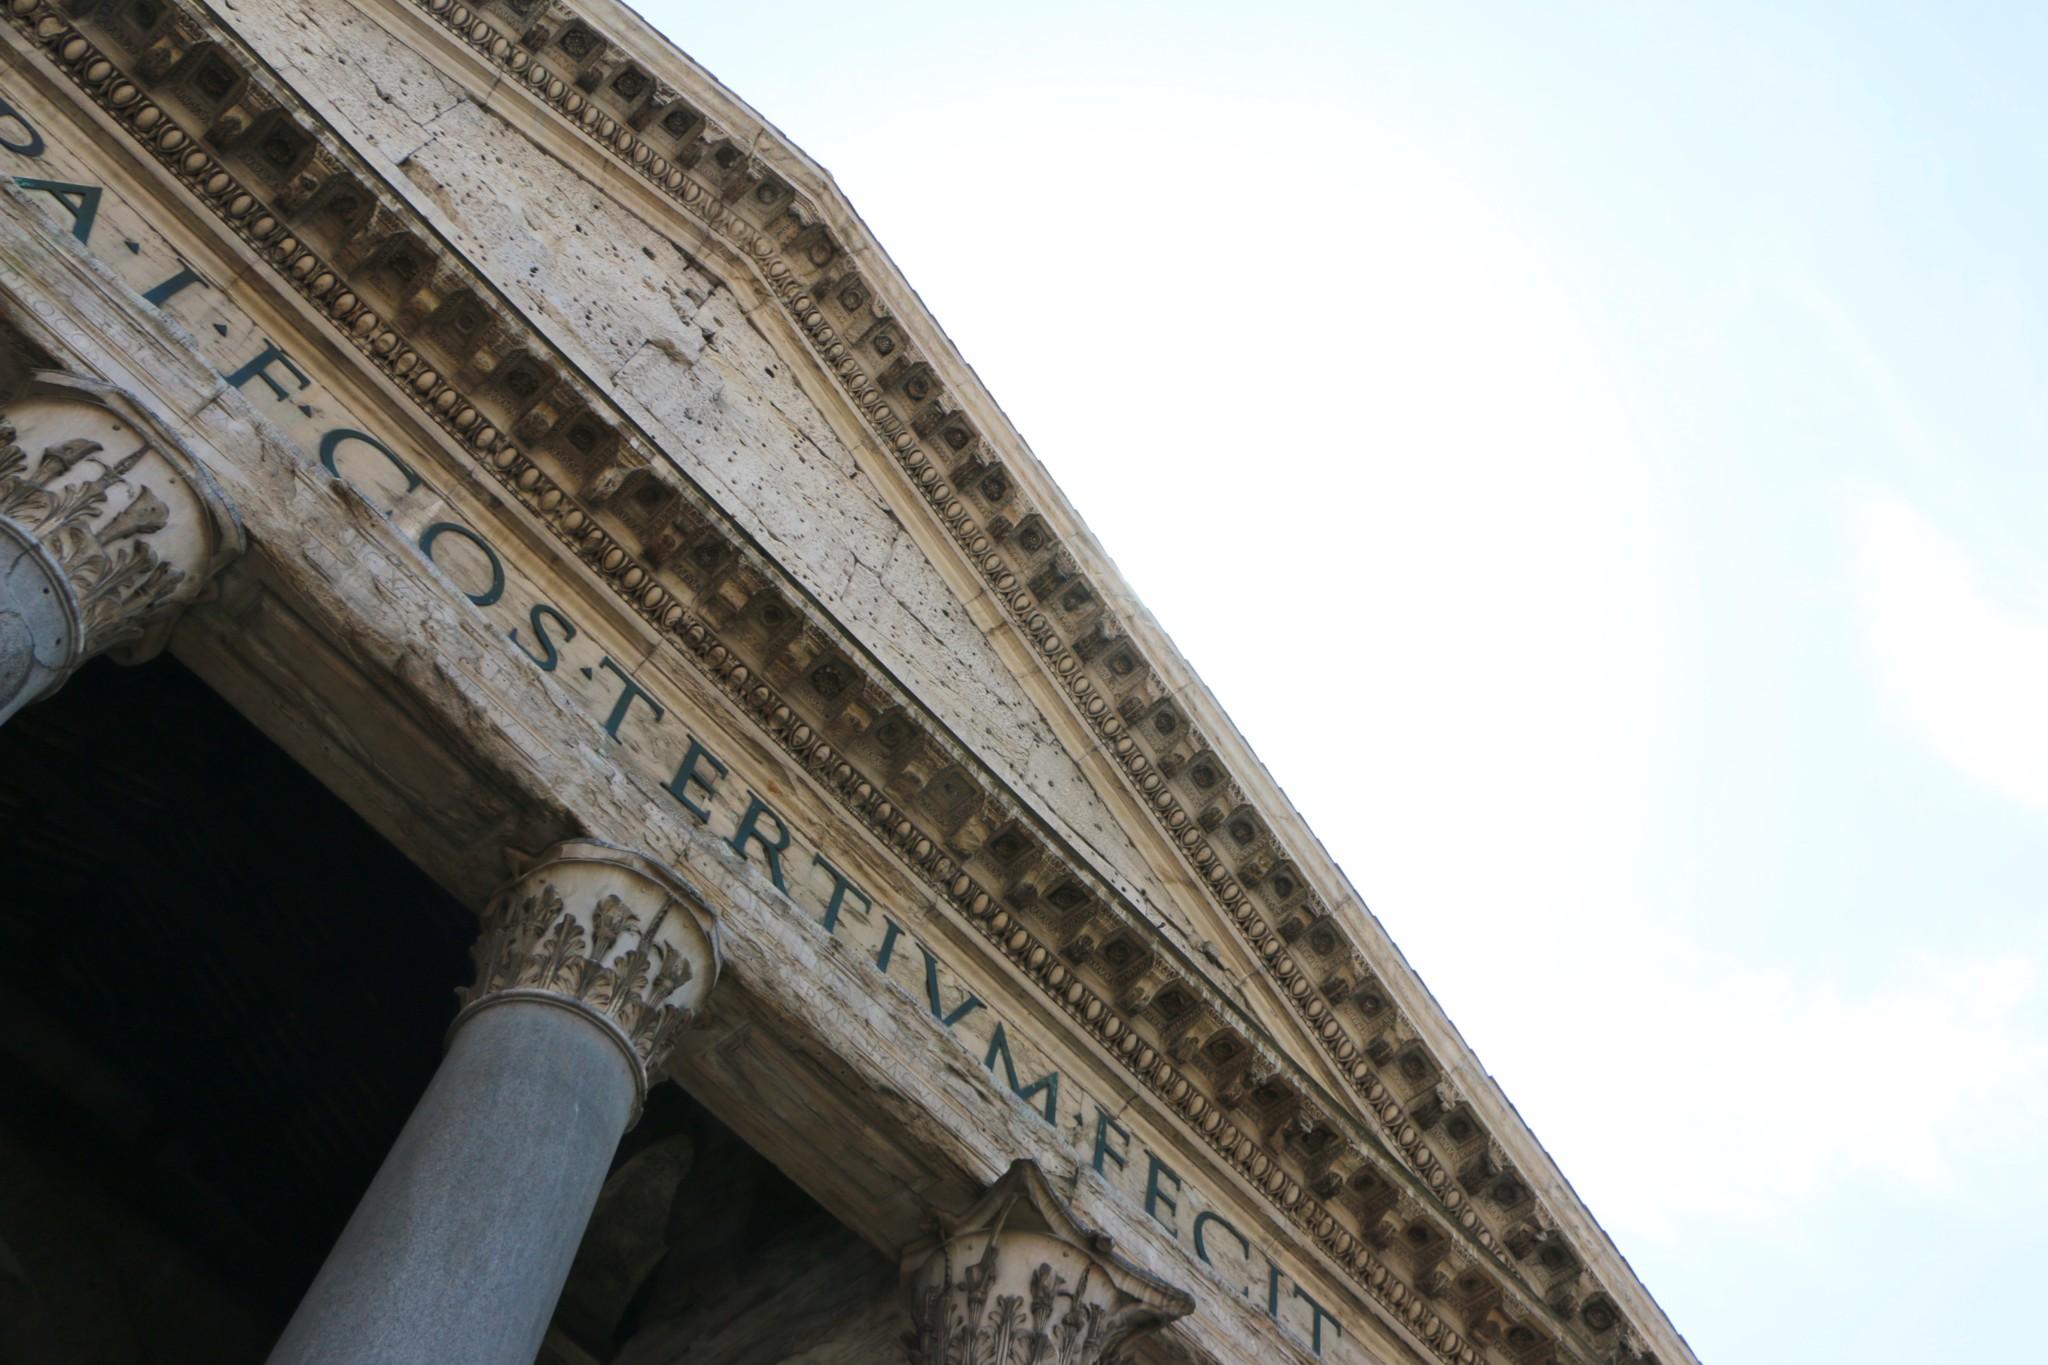 The Pantheon, Rome